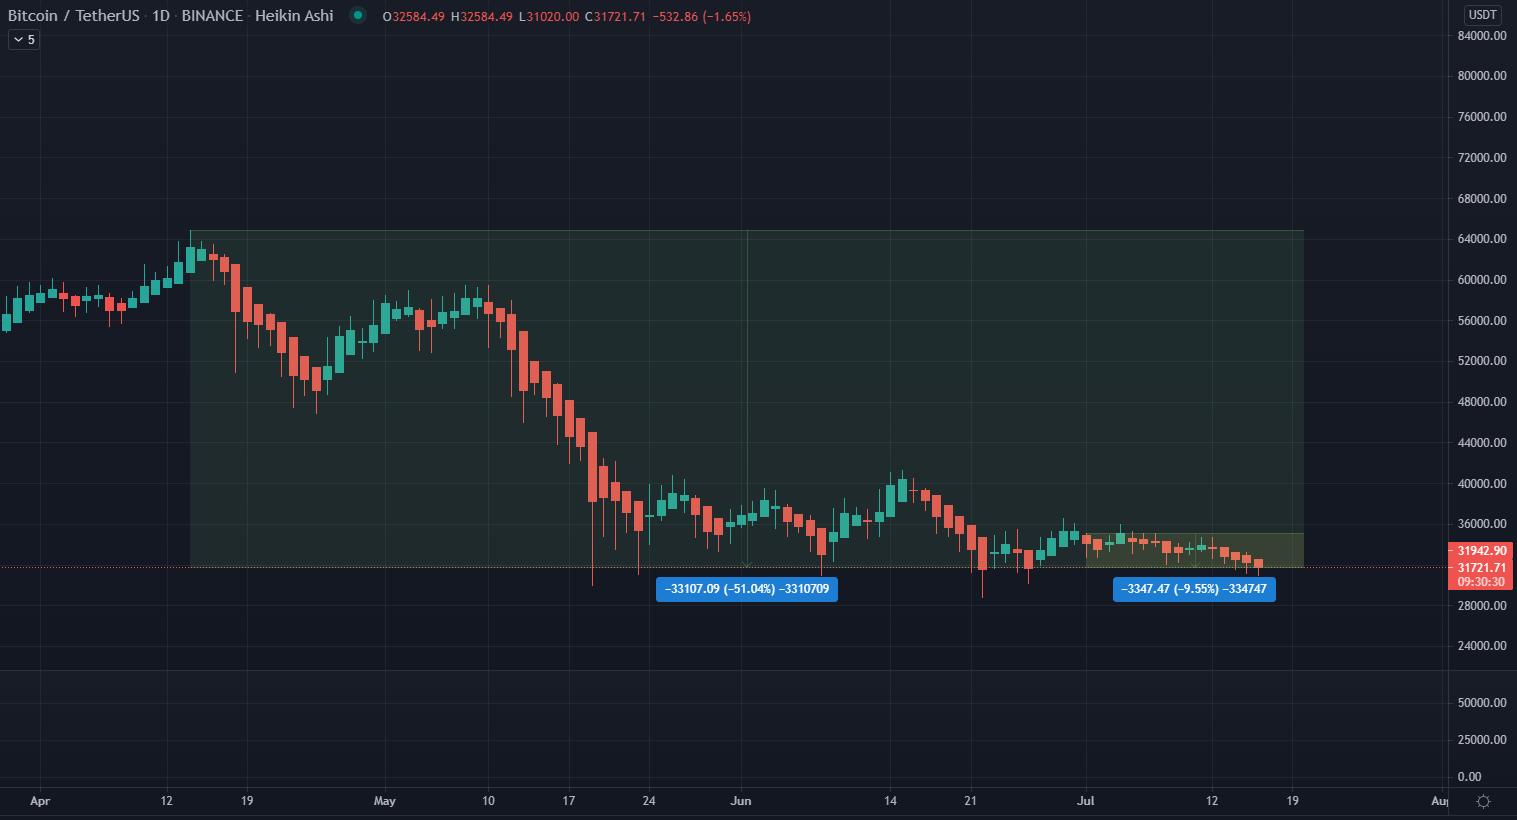 BTC Whales Accumulating as Exchange Deposits Signal Bearish Momentum